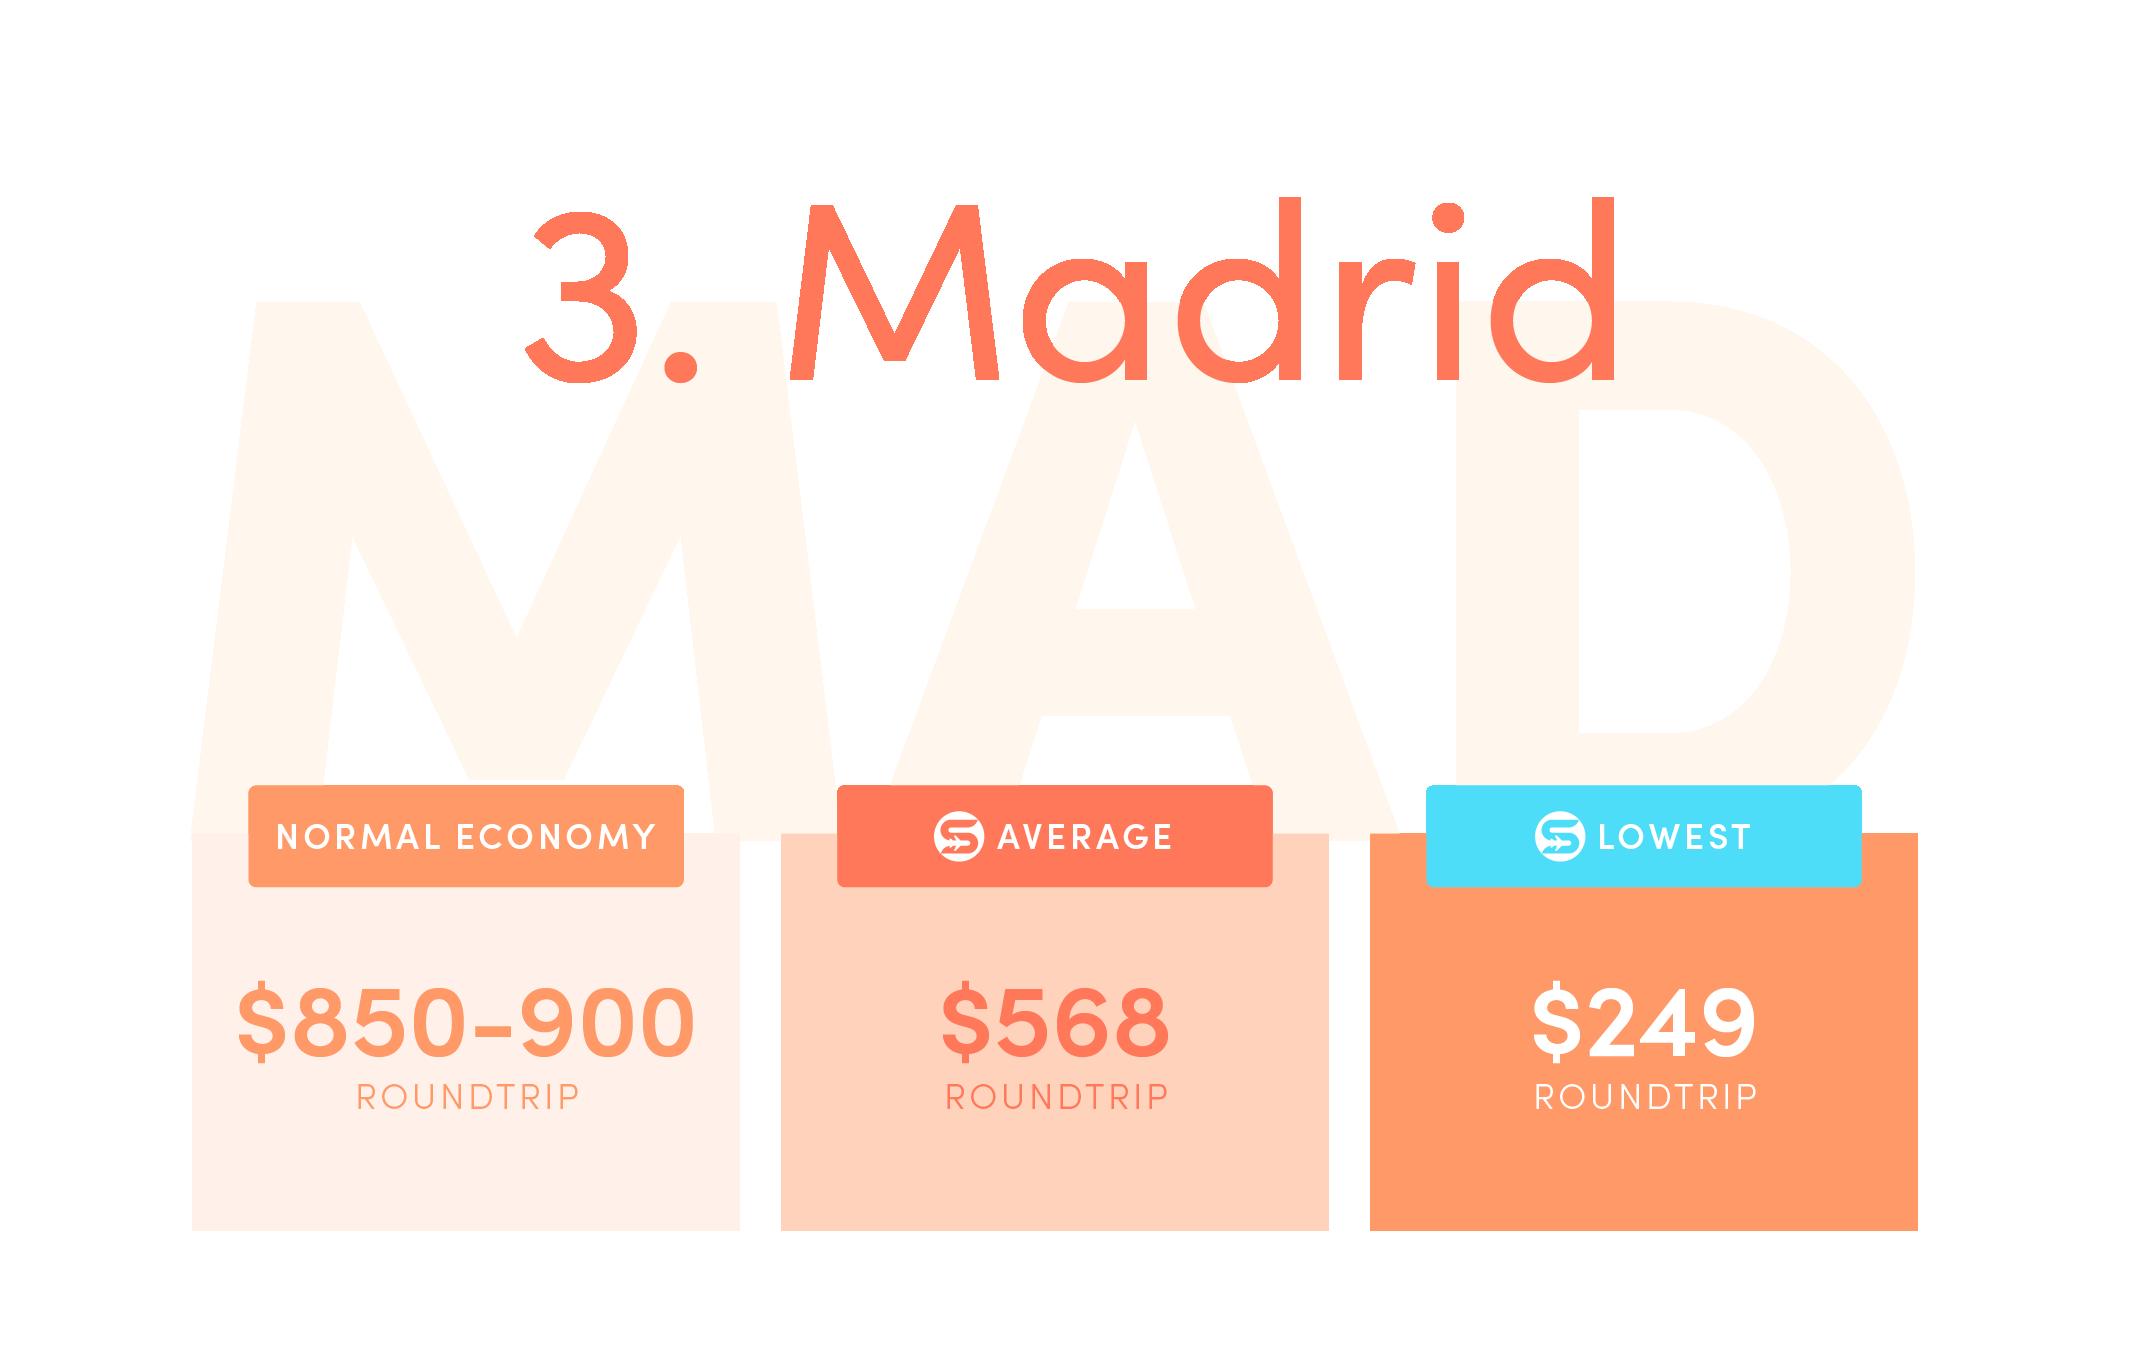 Madrid (MAD). Normal economy price from the US: $850-$900+ roundtrip. Average Scott's Cheap Flights economy price: $568 roundtrip. Lowest Scott's Cheap Flights price in 2021: $249 roundtrip.